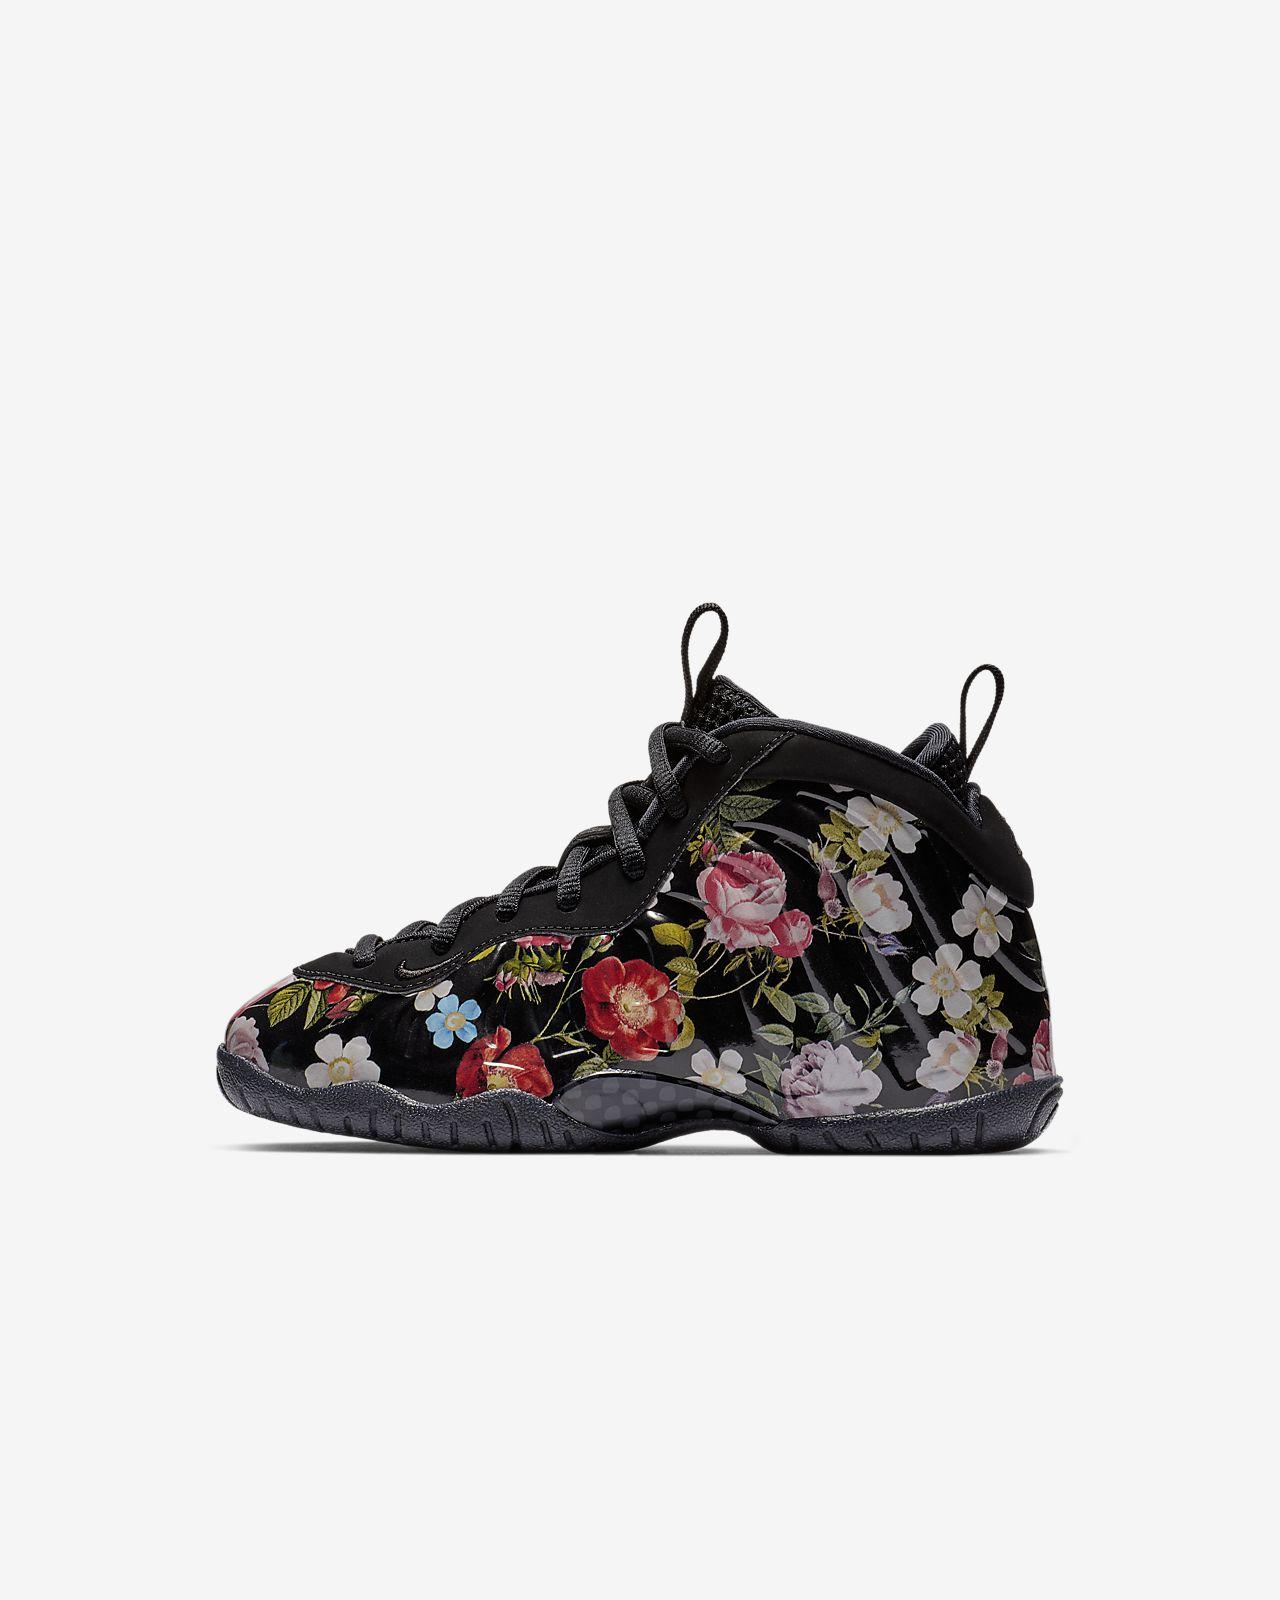 5440176559bb3 Nike Little Posite One Premium Little Kids  Floral Shoe. Nike.com